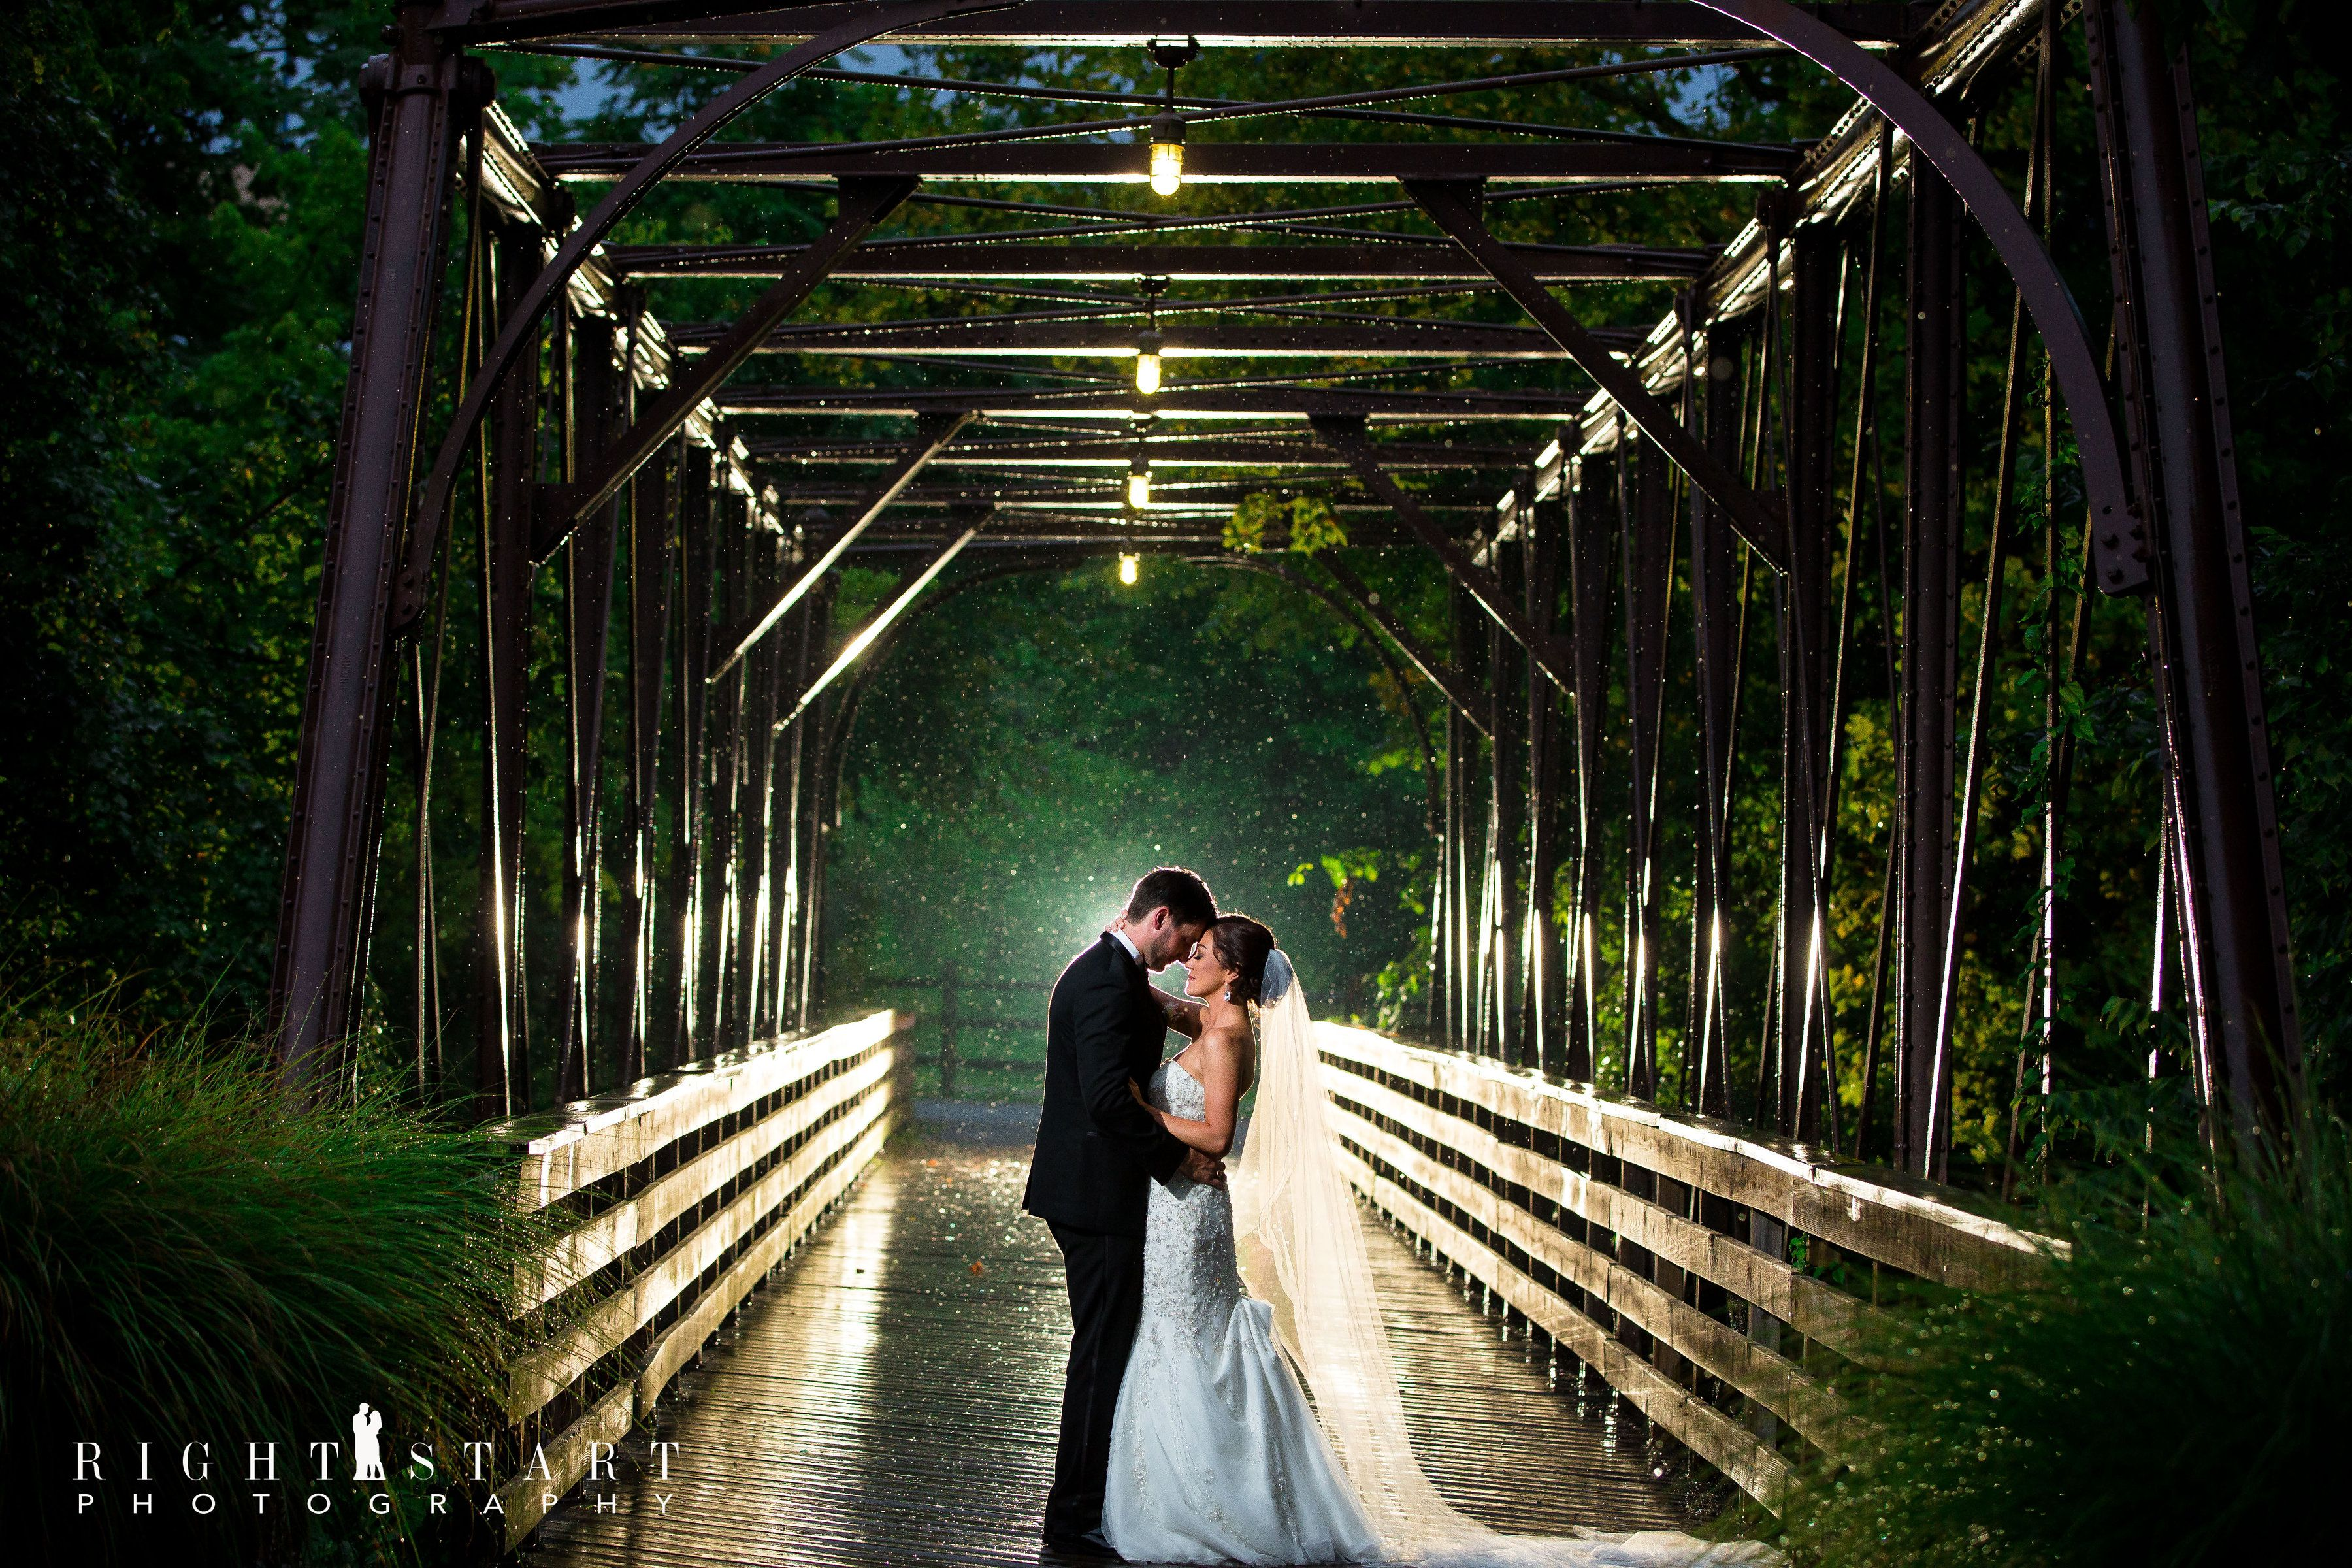 Right Start Photography Philadelphia wedding venues